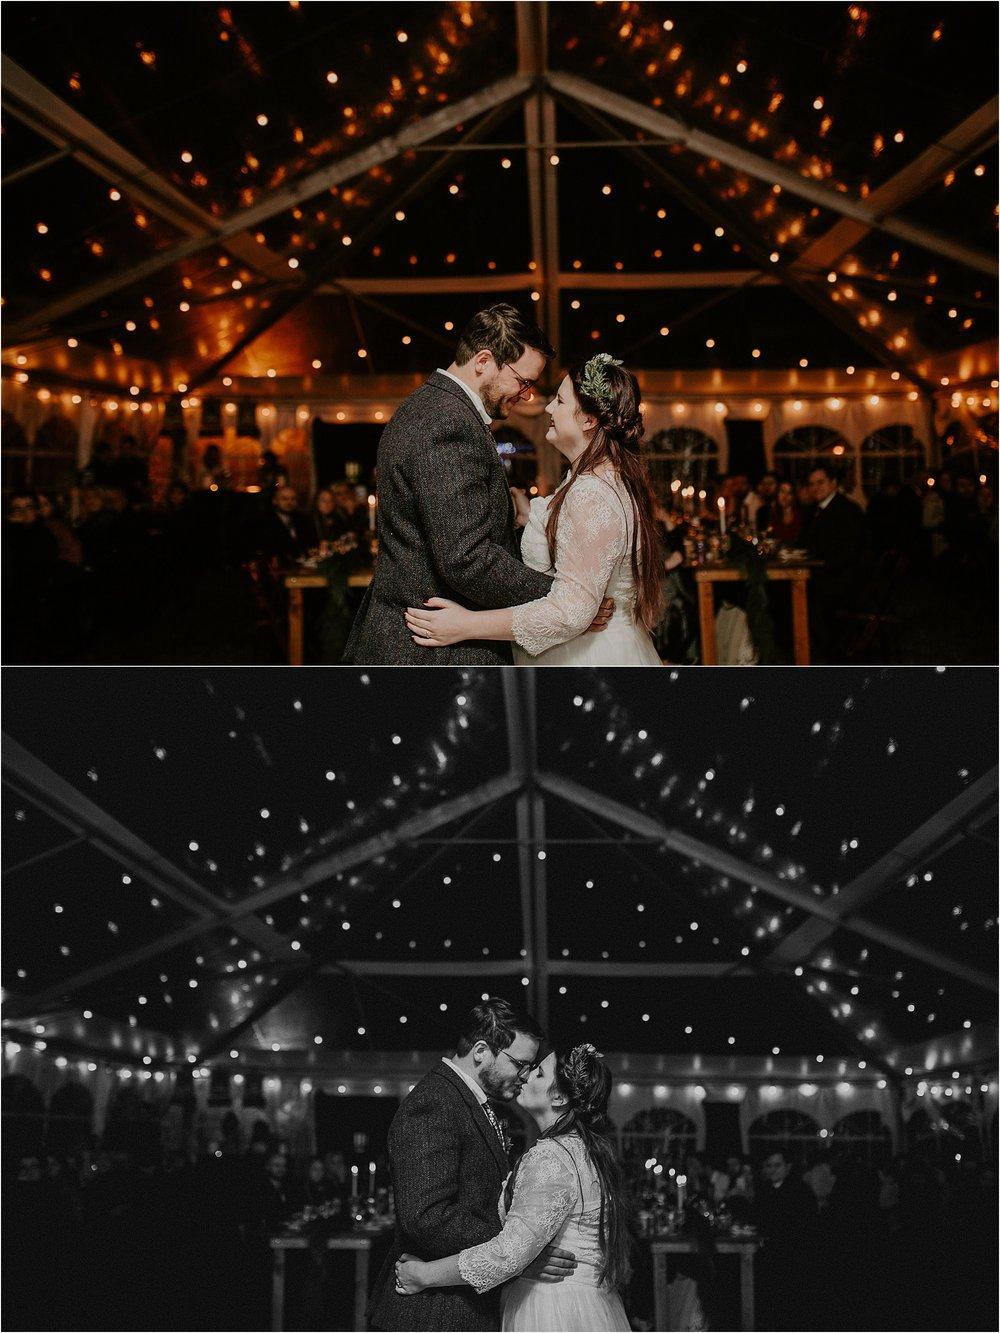 Sarah_Brookhart_Baltimore_Wedding_Photographer_0061.jpg